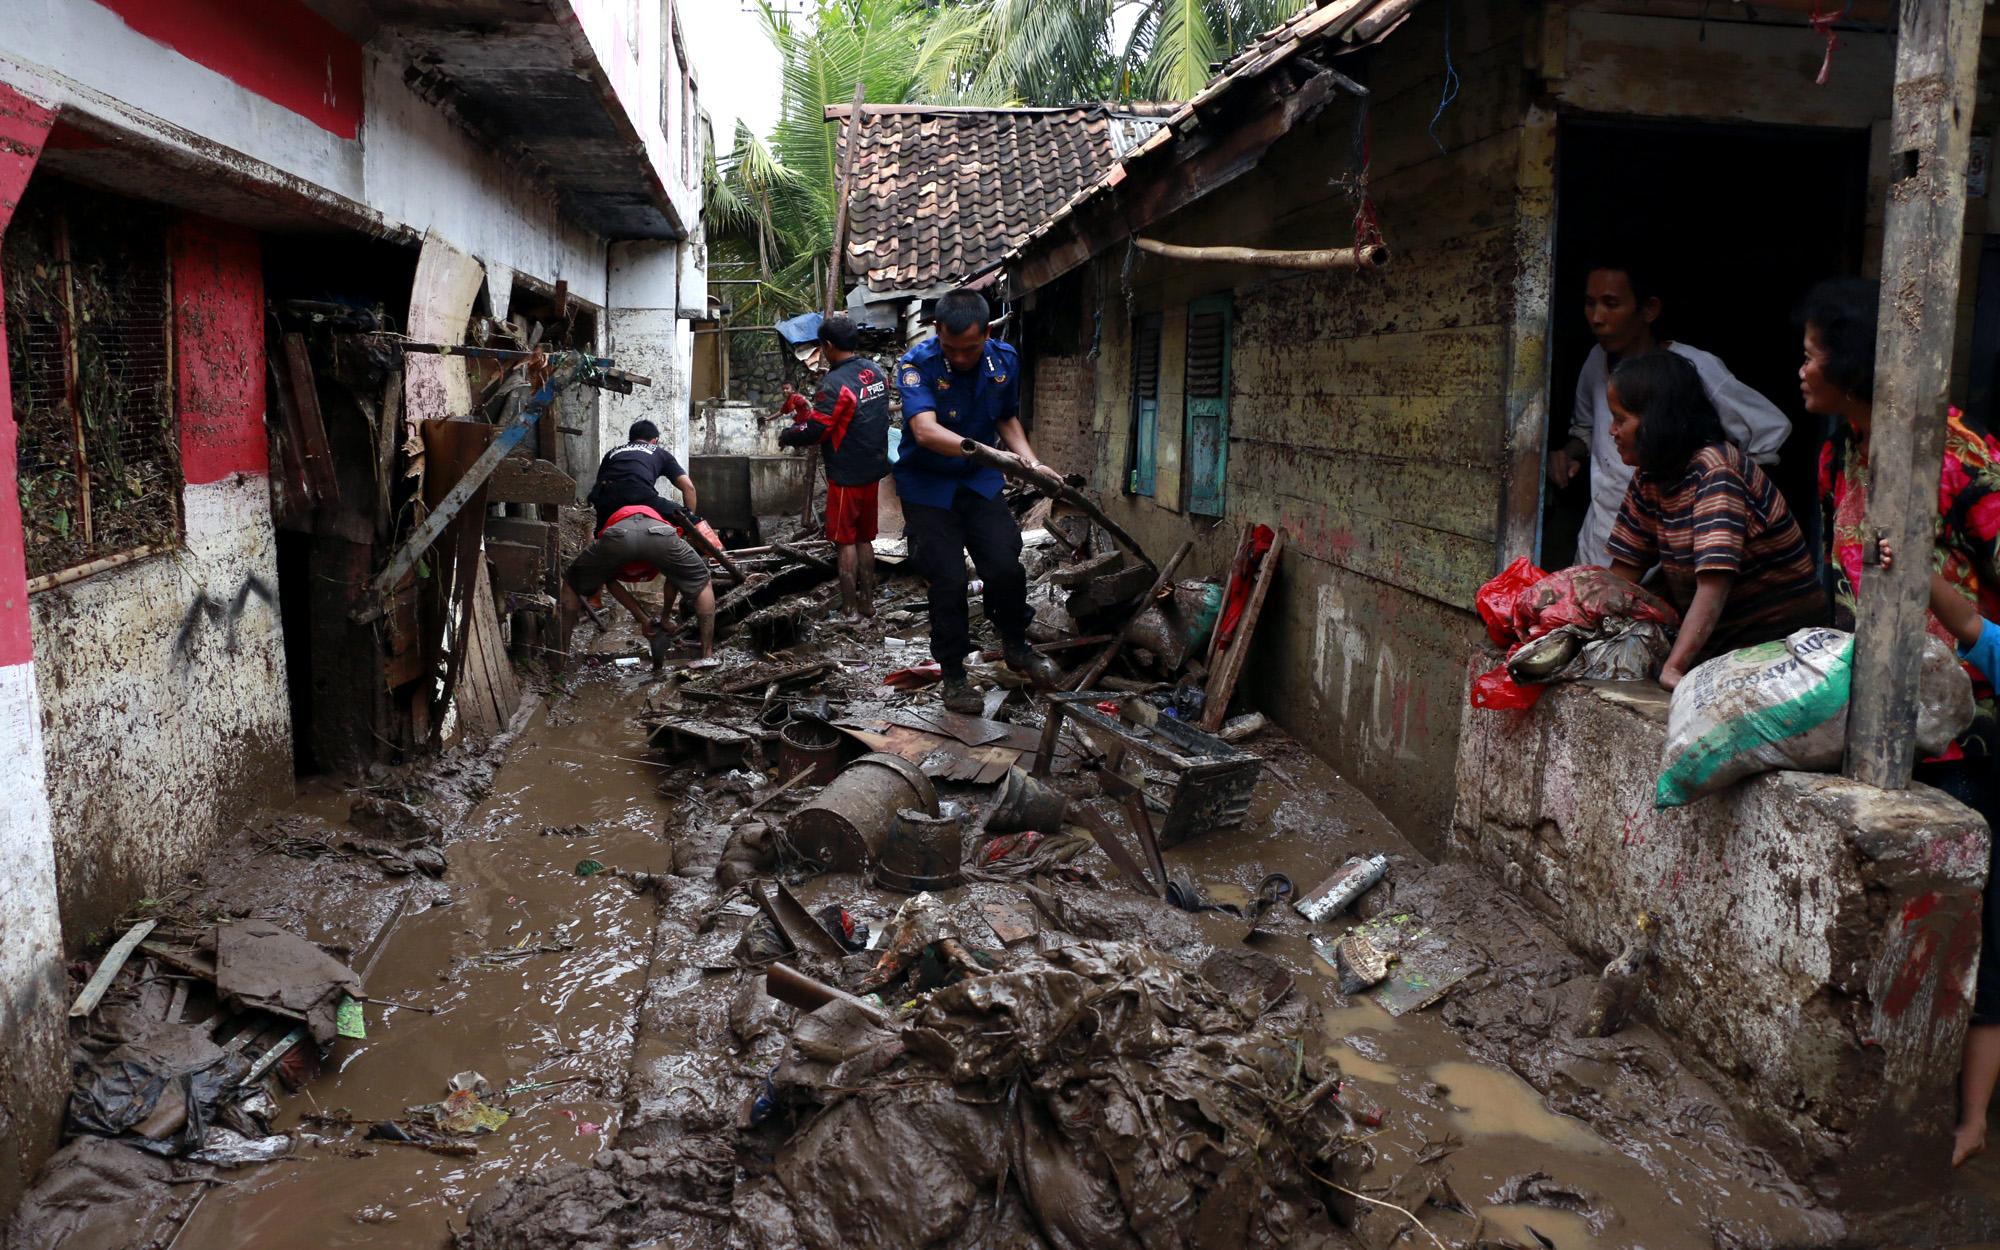 Petugas BPBD Kota Bandar Lampung membantu warga Telukbetung Selatan membersihkan dan mengevakuasi barang yang terendam lumpur akibat banjir setinggi 2 meter. (Lampungnews/El Shinta)